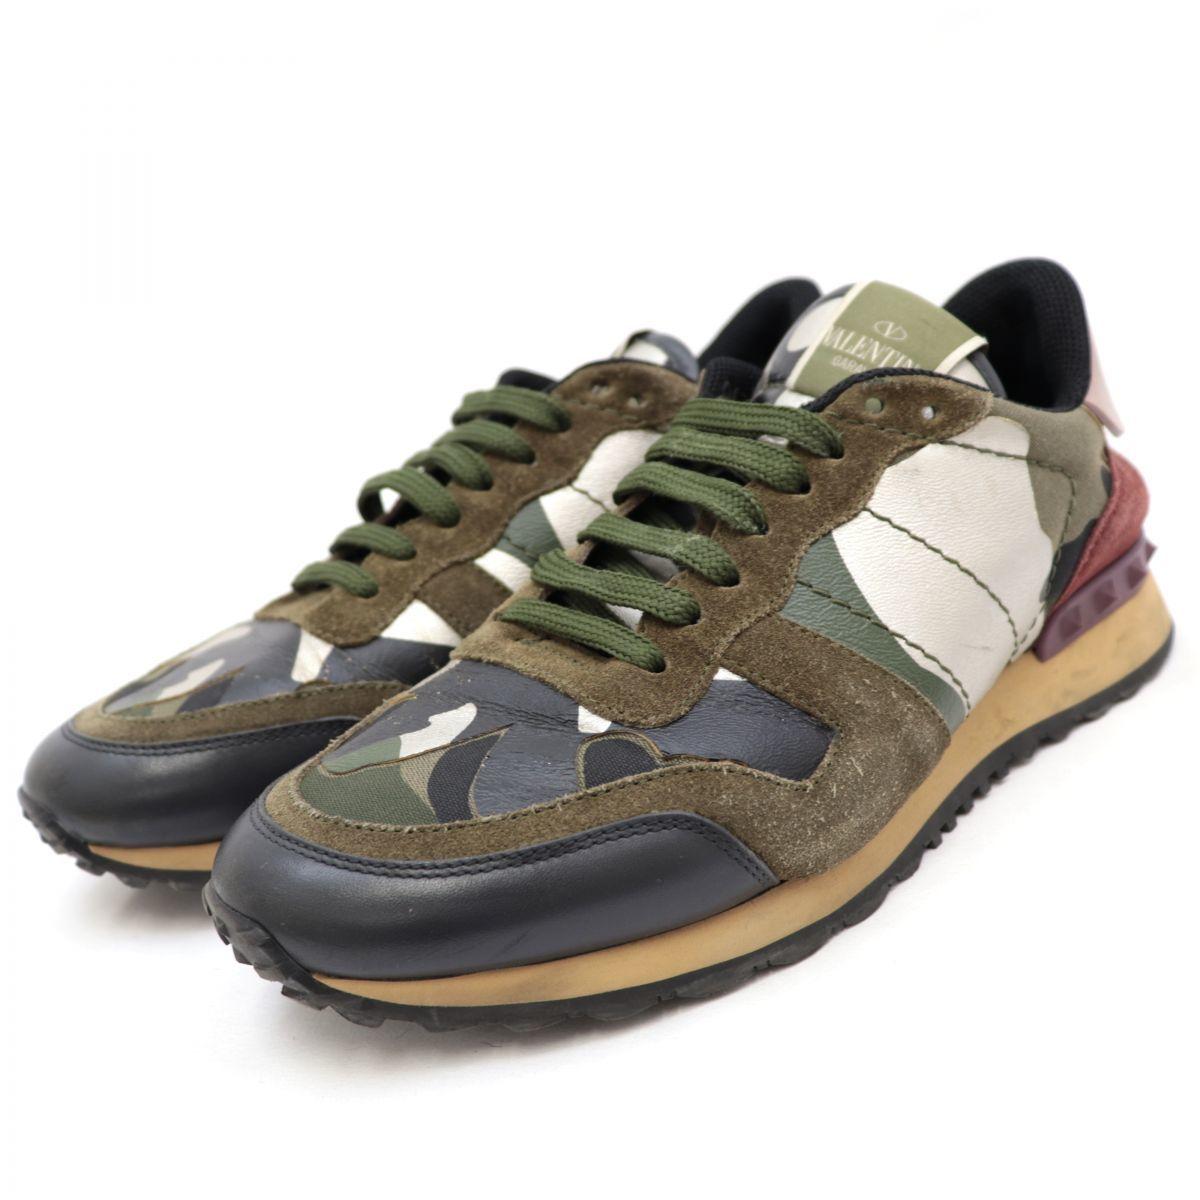 Valentino Garavani Camouflage Suede Sneakers Men's Khaki Multi Rock Studs